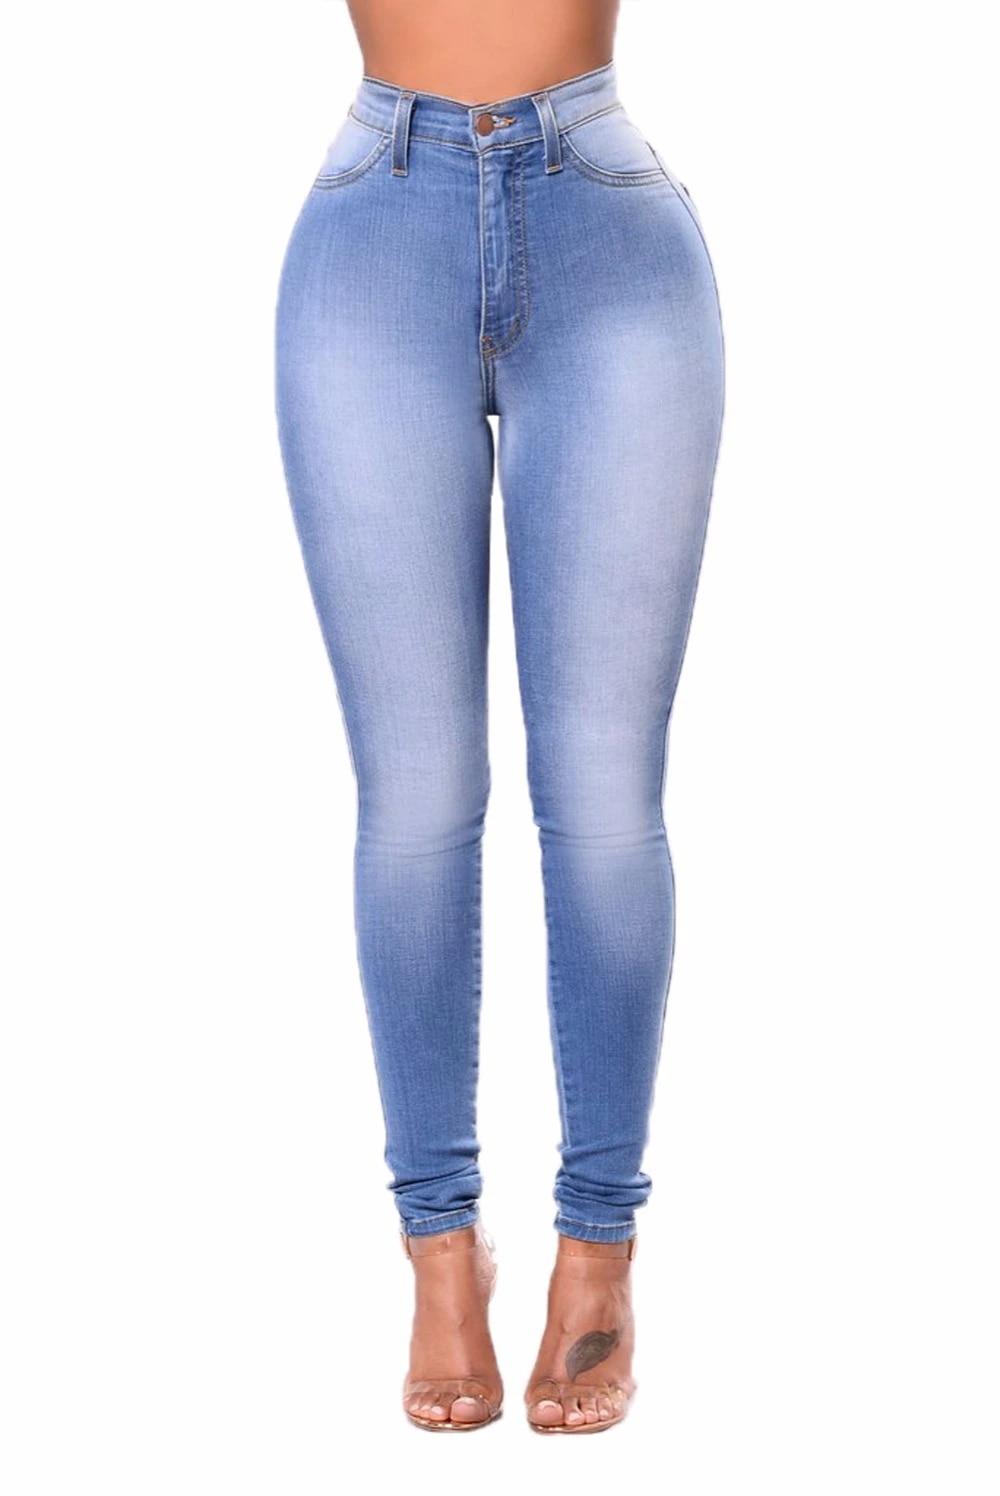 Venta Al Por Mayor S 3xl Pantalones Vaqueros Ajustados Tipo Lápiz Leggings Jeans Xxx Usa Leggings Sexy Mujer Foto Sexo Jeans Fashion Women Jeans Wholesale Women Jeanswomen Fashion Jeans Aliexpress